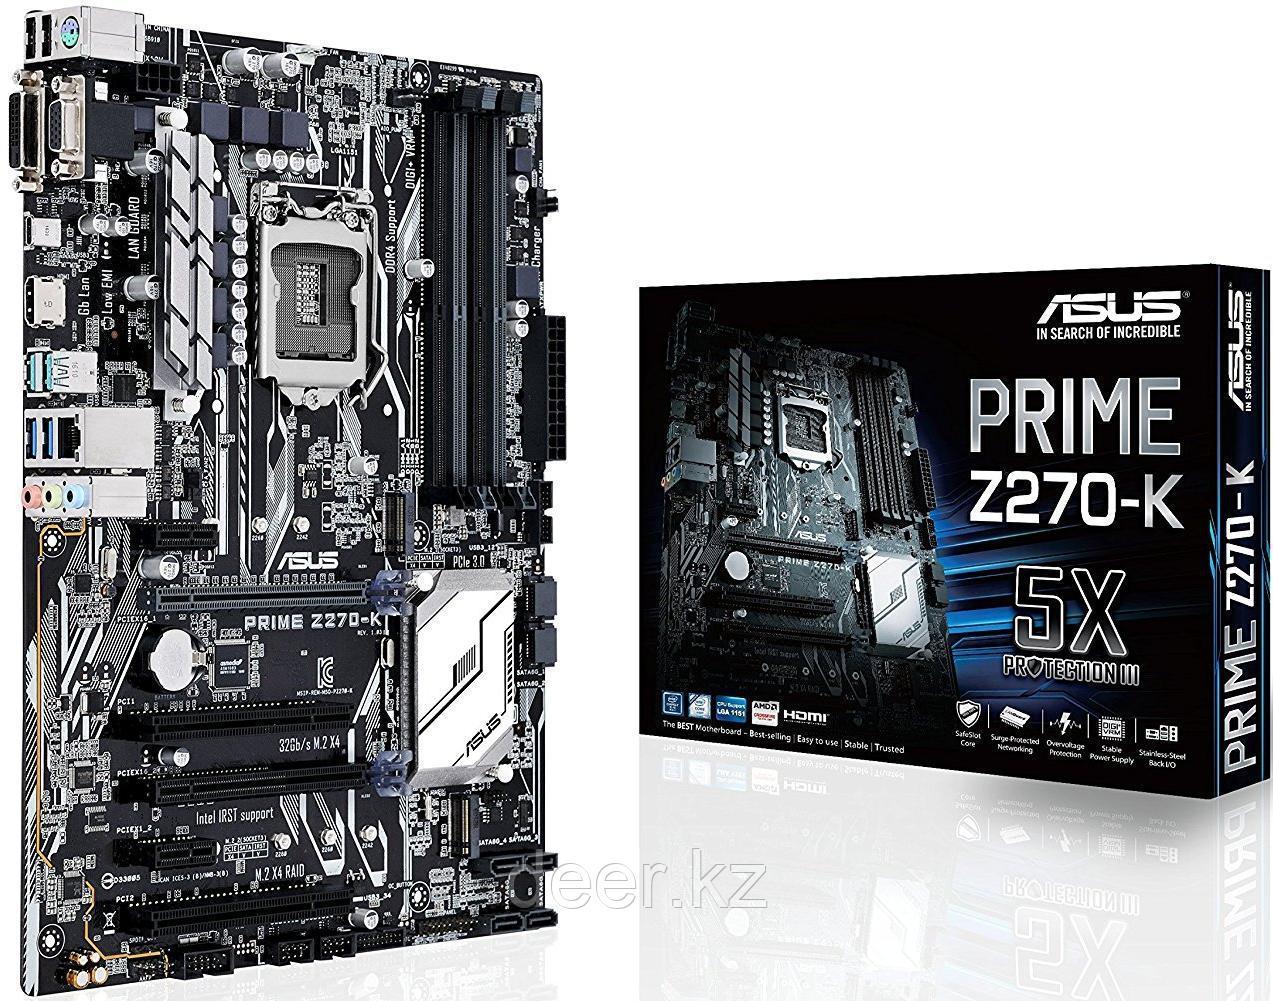 Сист. плата Asus PRIME Z270-K, Z270, S1151, 4xDIMM DDR4